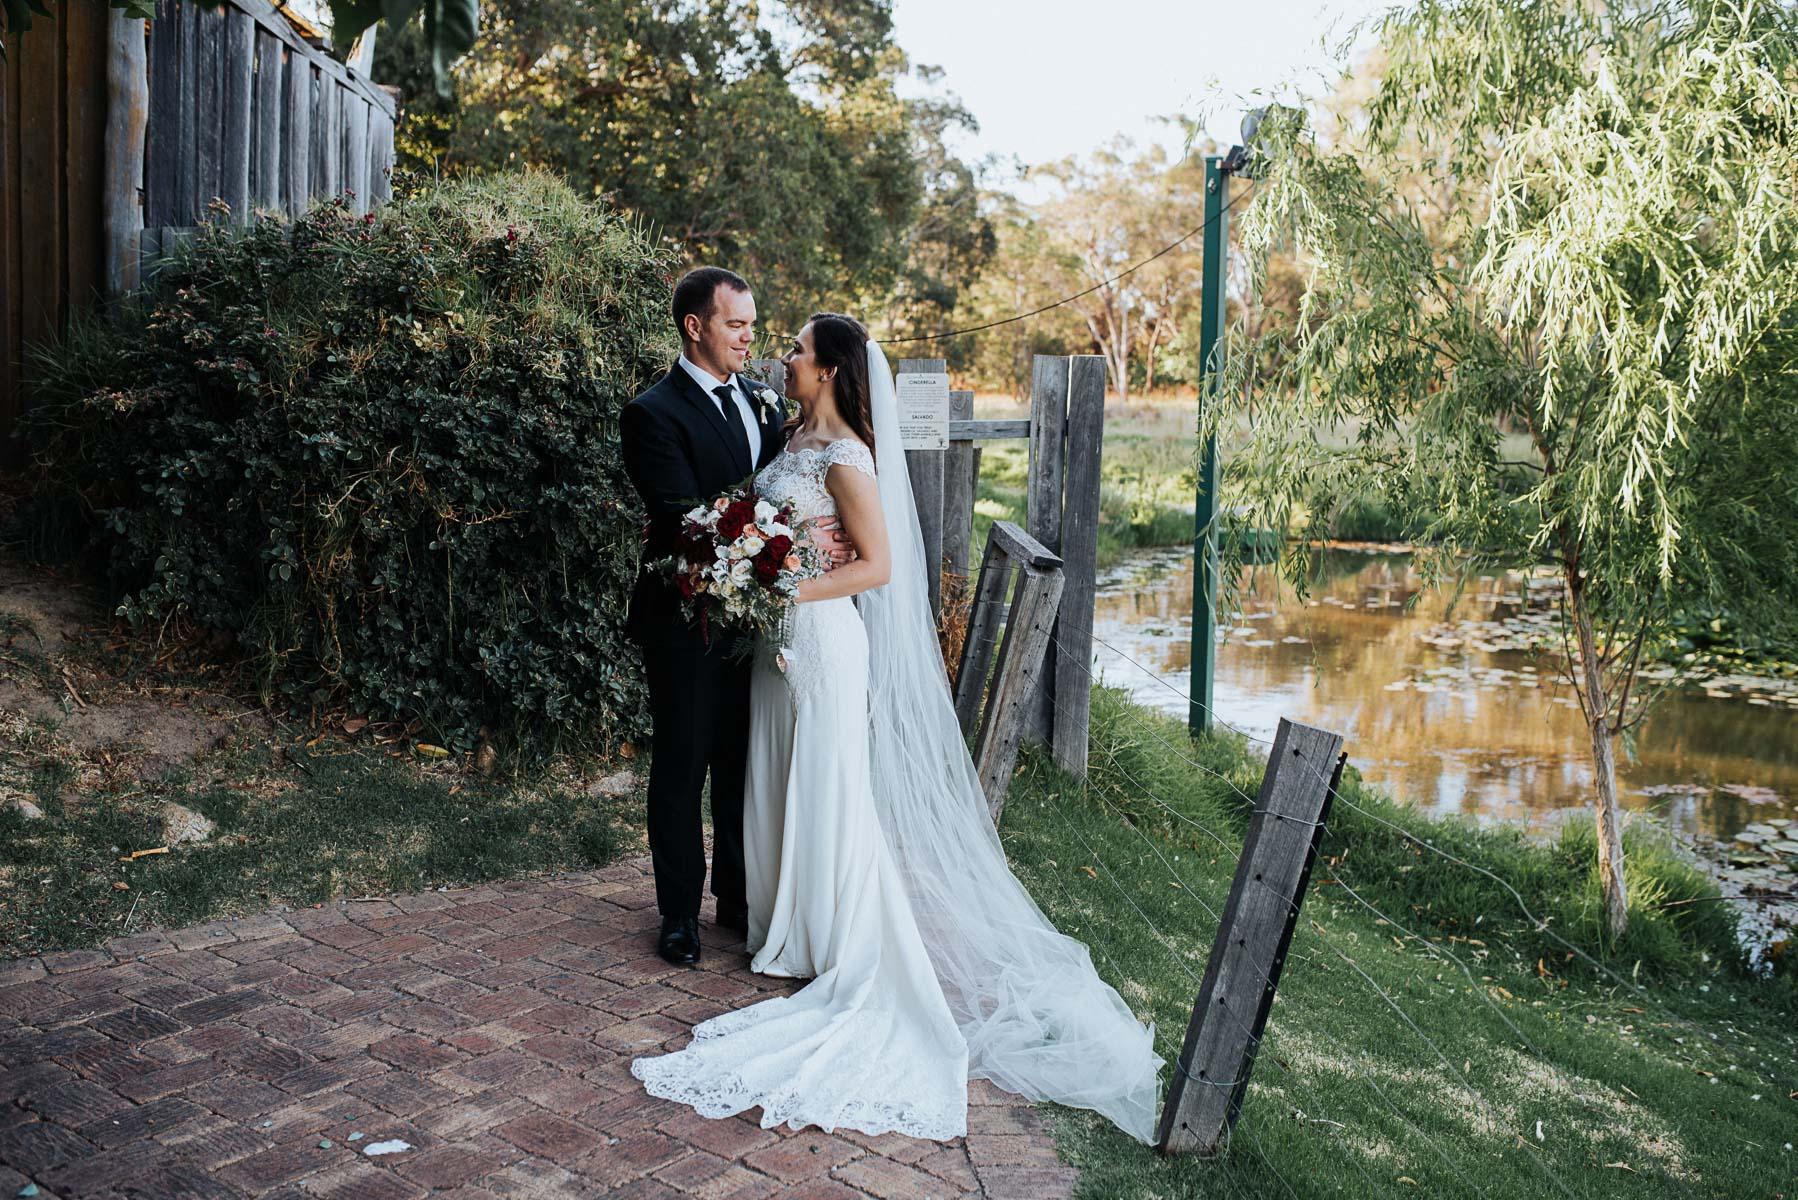 paige-john-chapel-farm-wedding-43.JPG